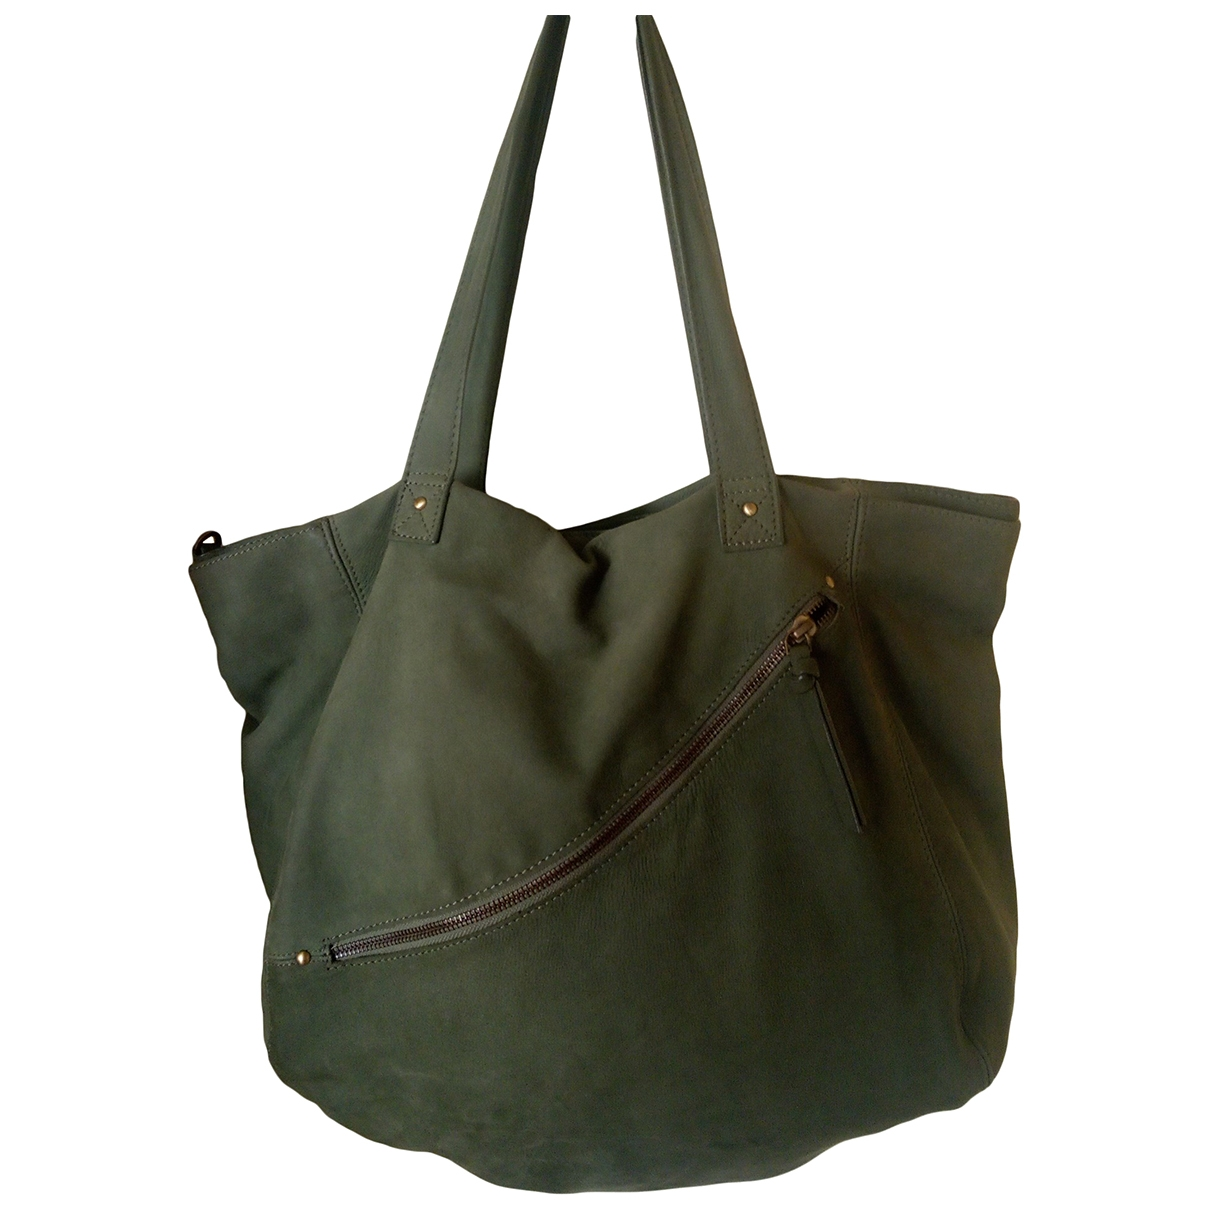 American Vintage \N Handtasche in  Gruen Leder